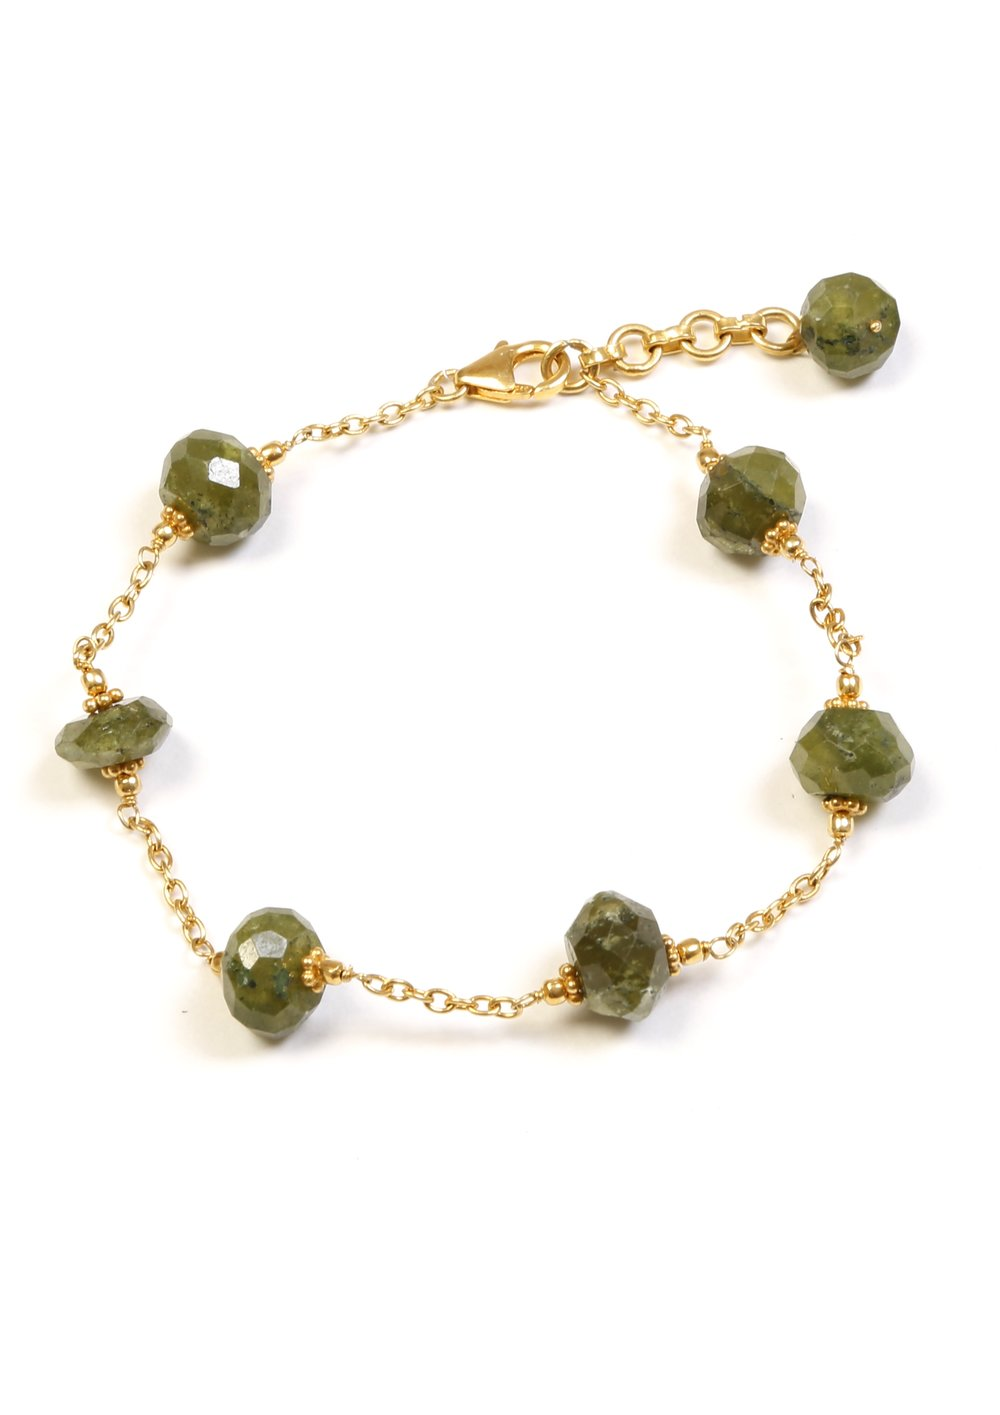 Green stone bracelet - 28€ NOW 20€